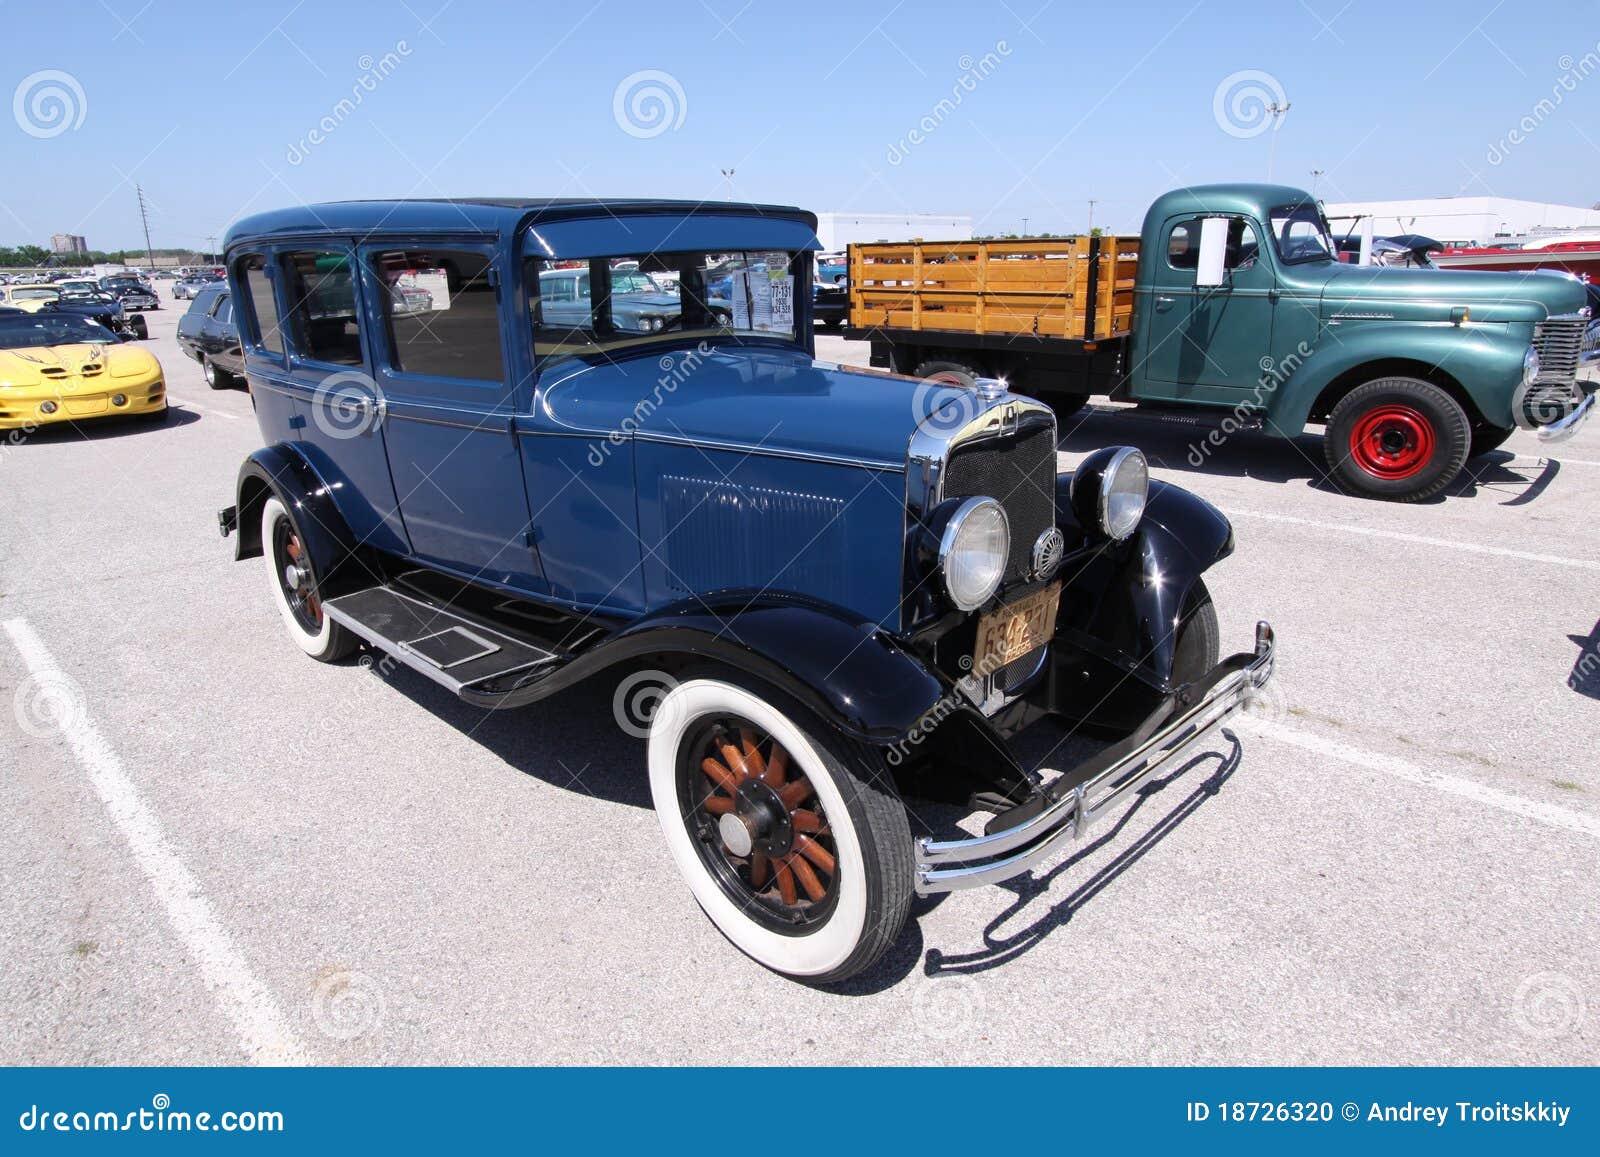 Plymouth model 30u 1930 editorial image image of sedan for 1930 plymouth 4 door sedan